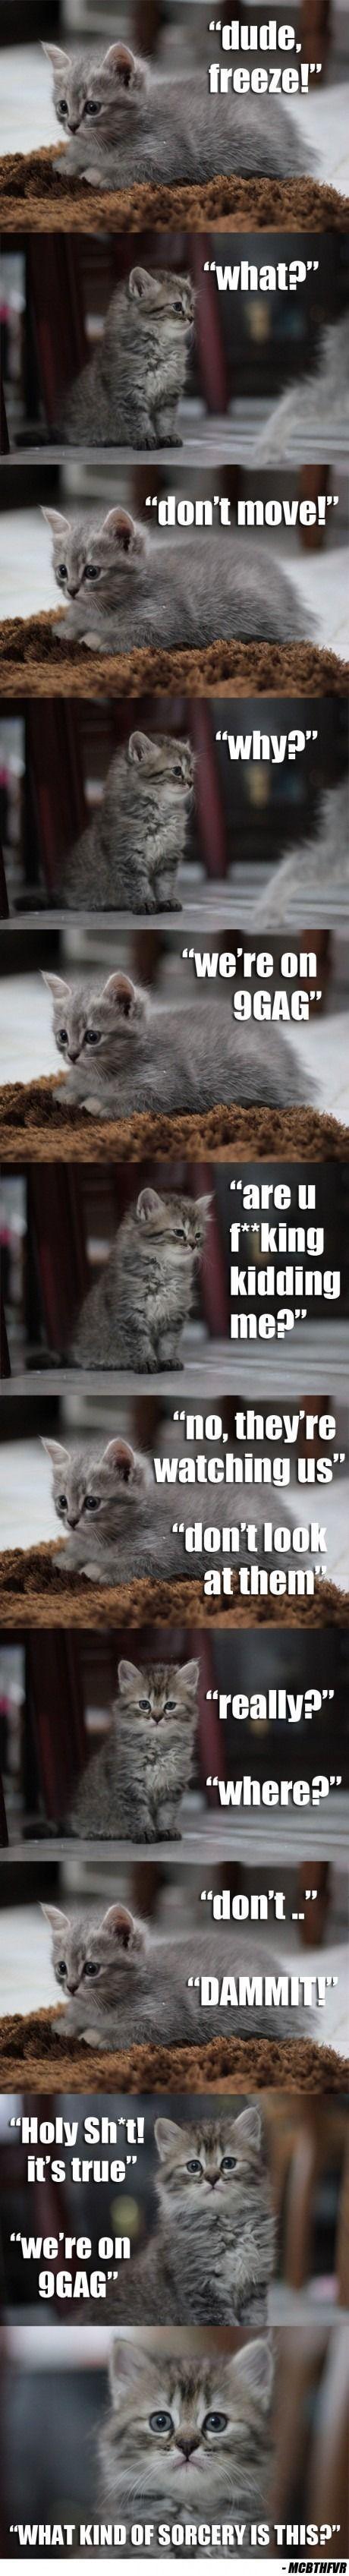 Mine killinger